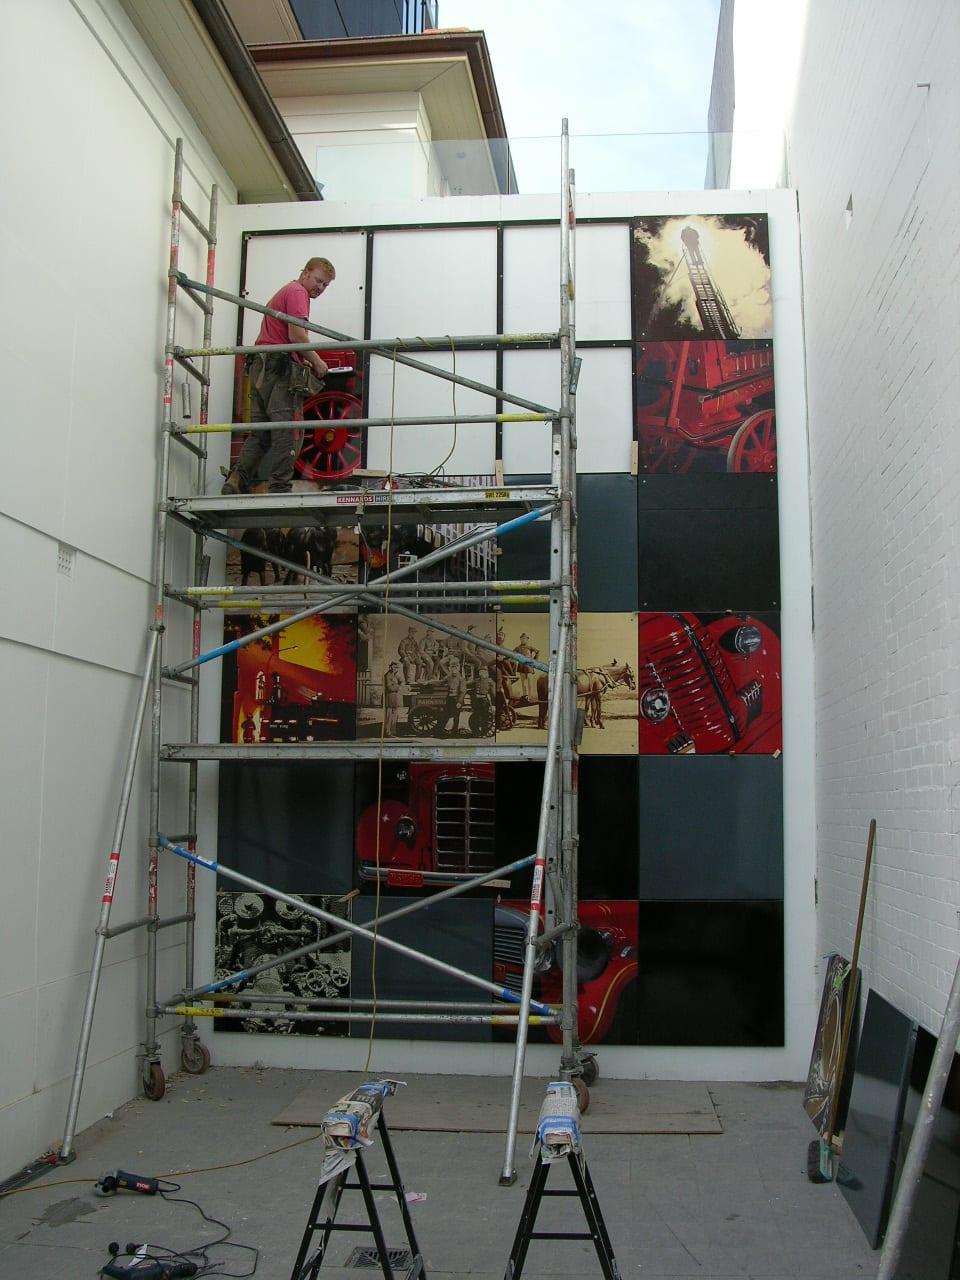 Parramatta Fire Station Photo 10